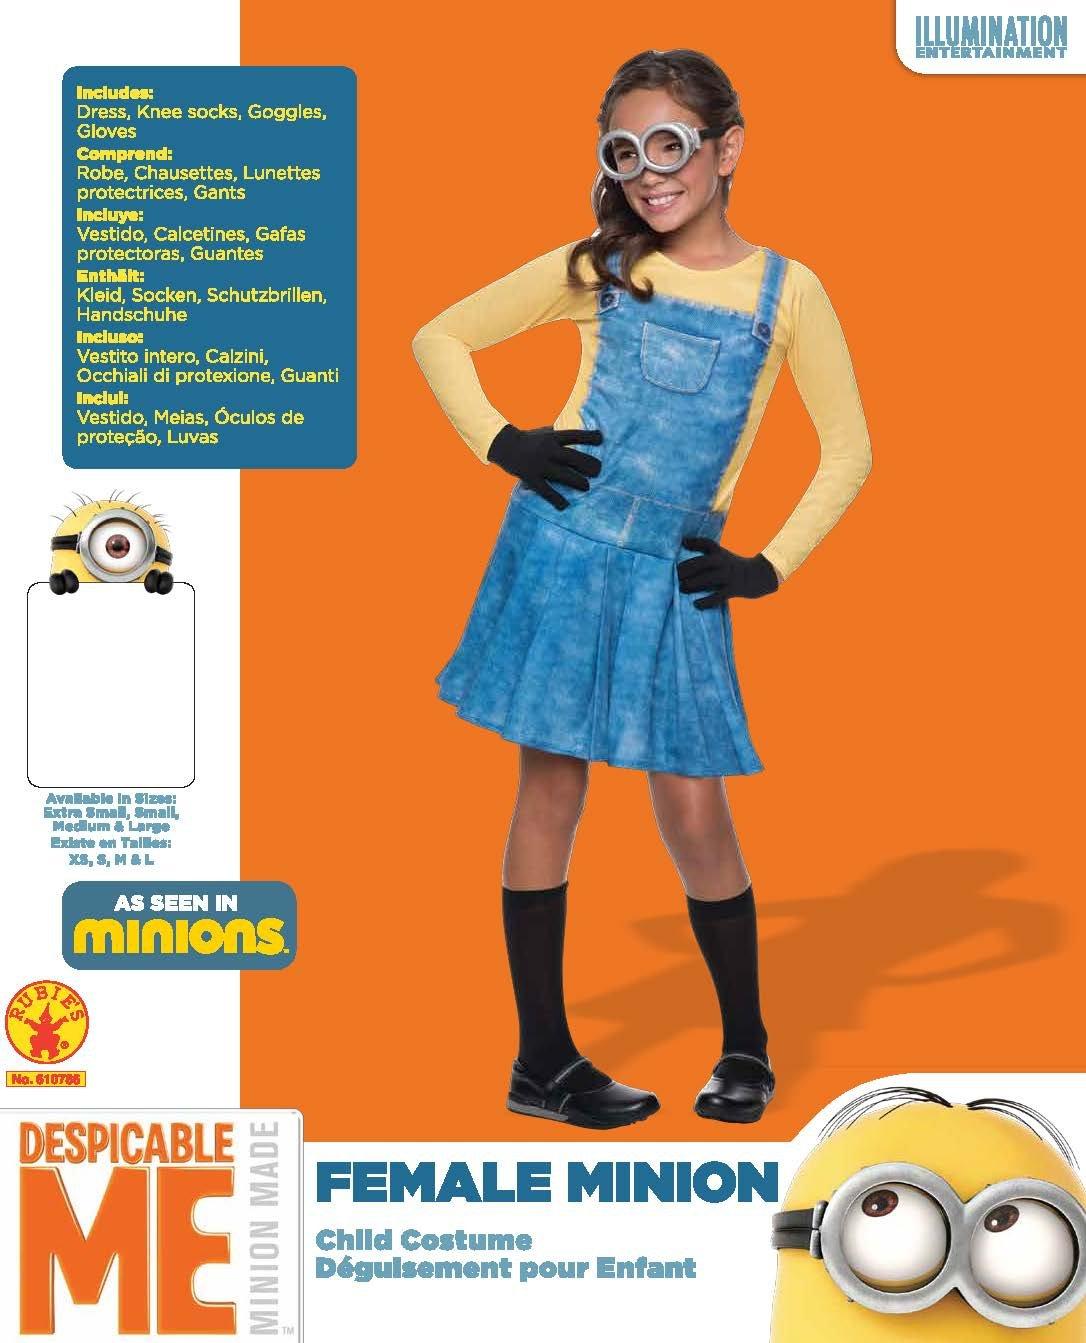 Amazon.com: Rubies Costume Minions Female Child Costume, Small: Toys & Games